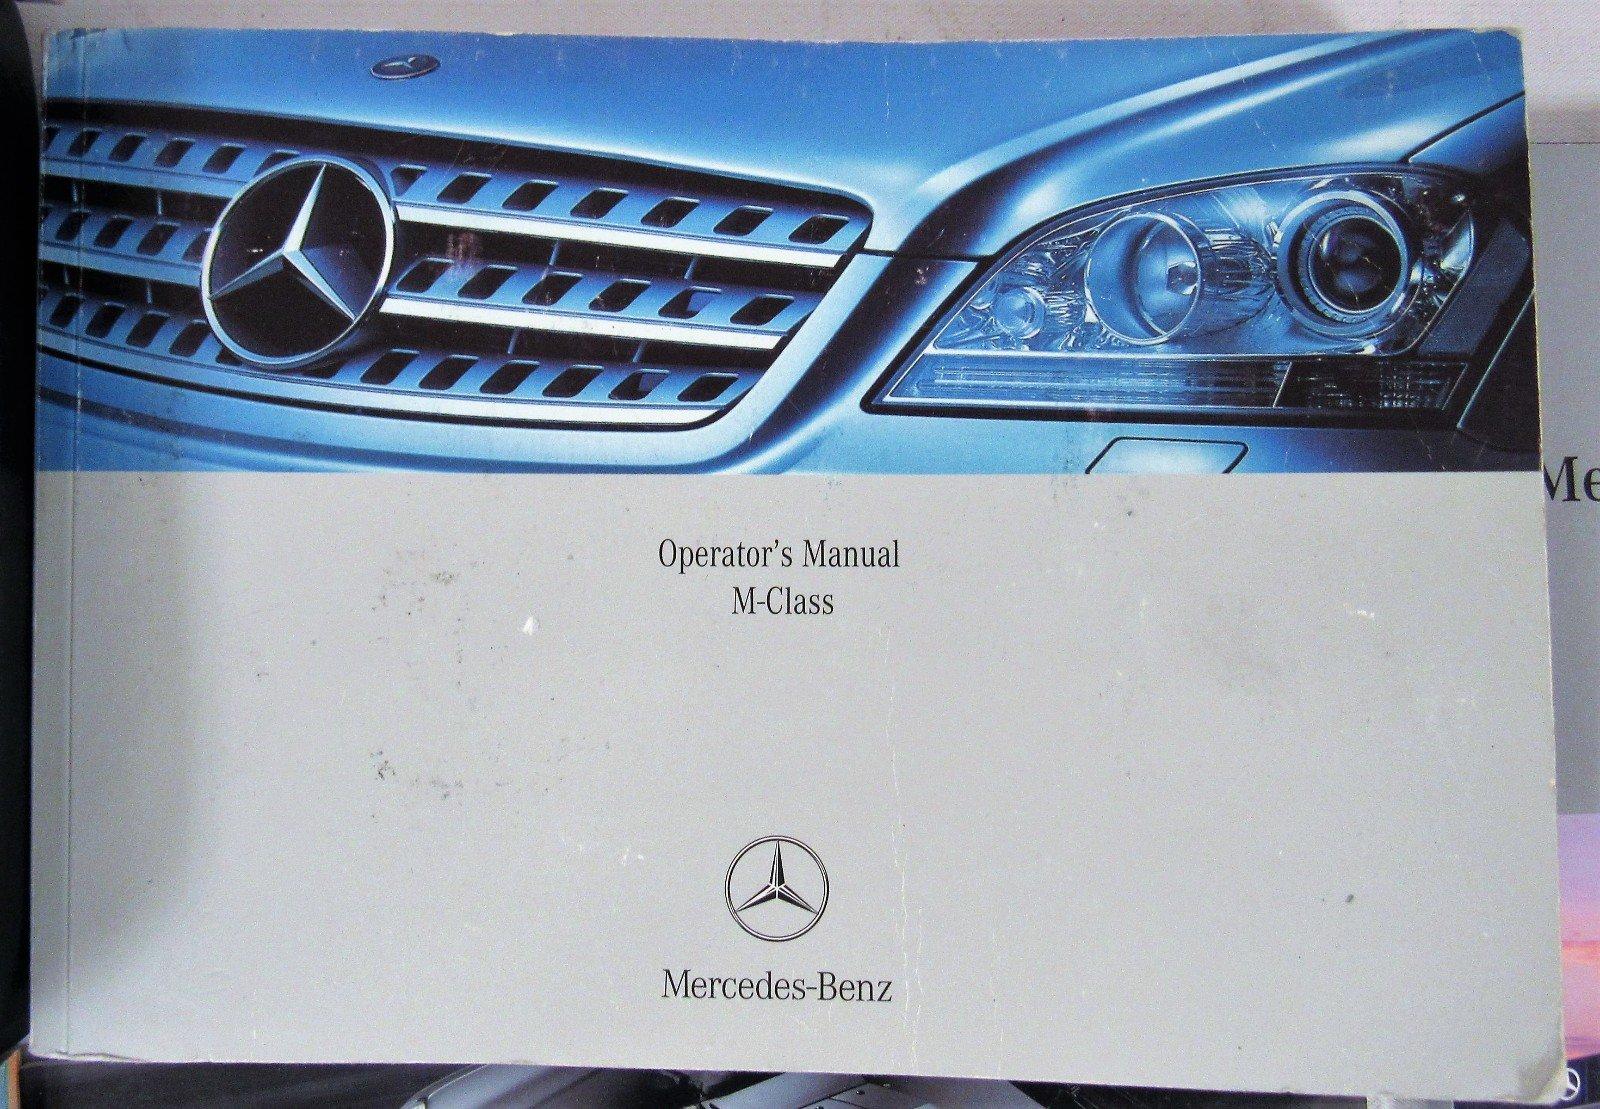 2006 MERCEDES-BENZ ML350 ML500 OWNER'S MANUAL SET: Mercedez-Benz:  0682821521188: Amazon.com: Books